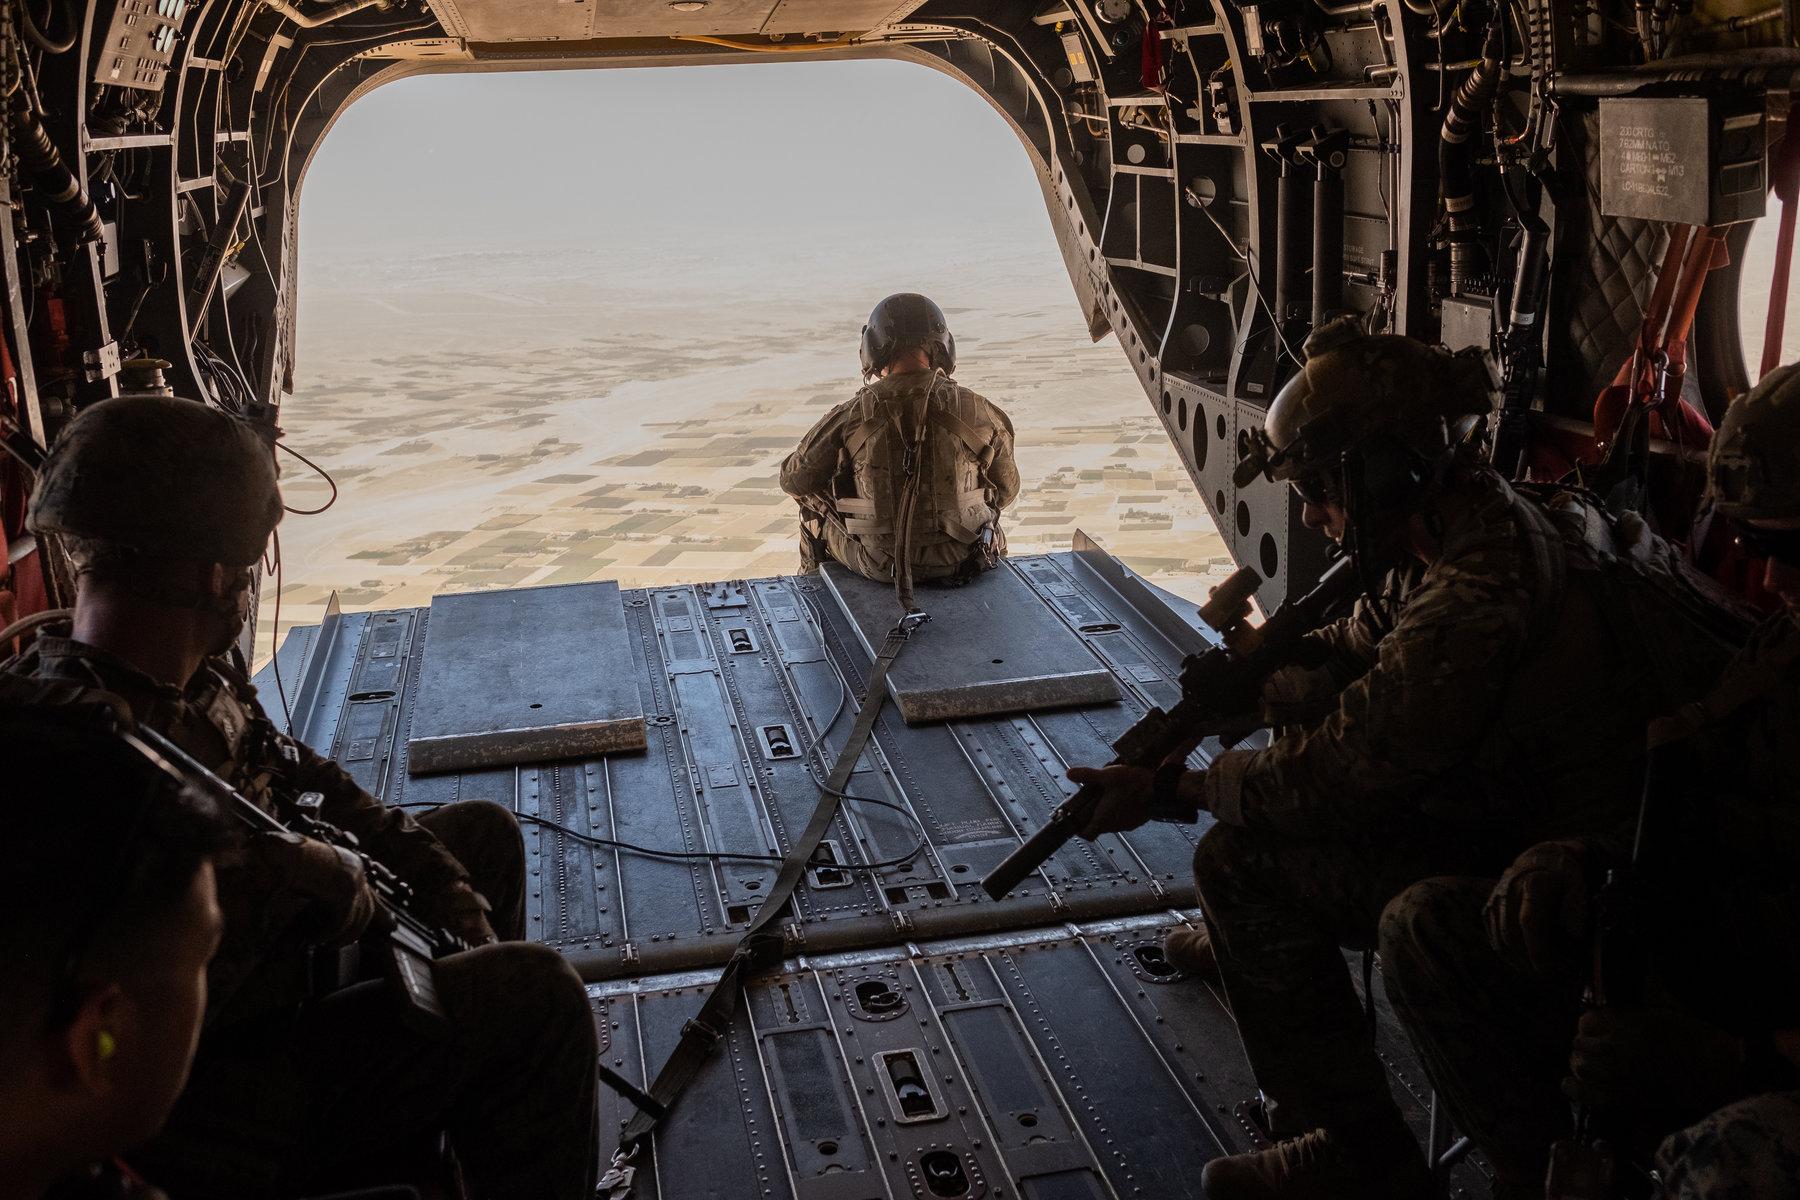 US withdrawal from Afghanistan: Regional fears of turmoil in the region (Part 4)